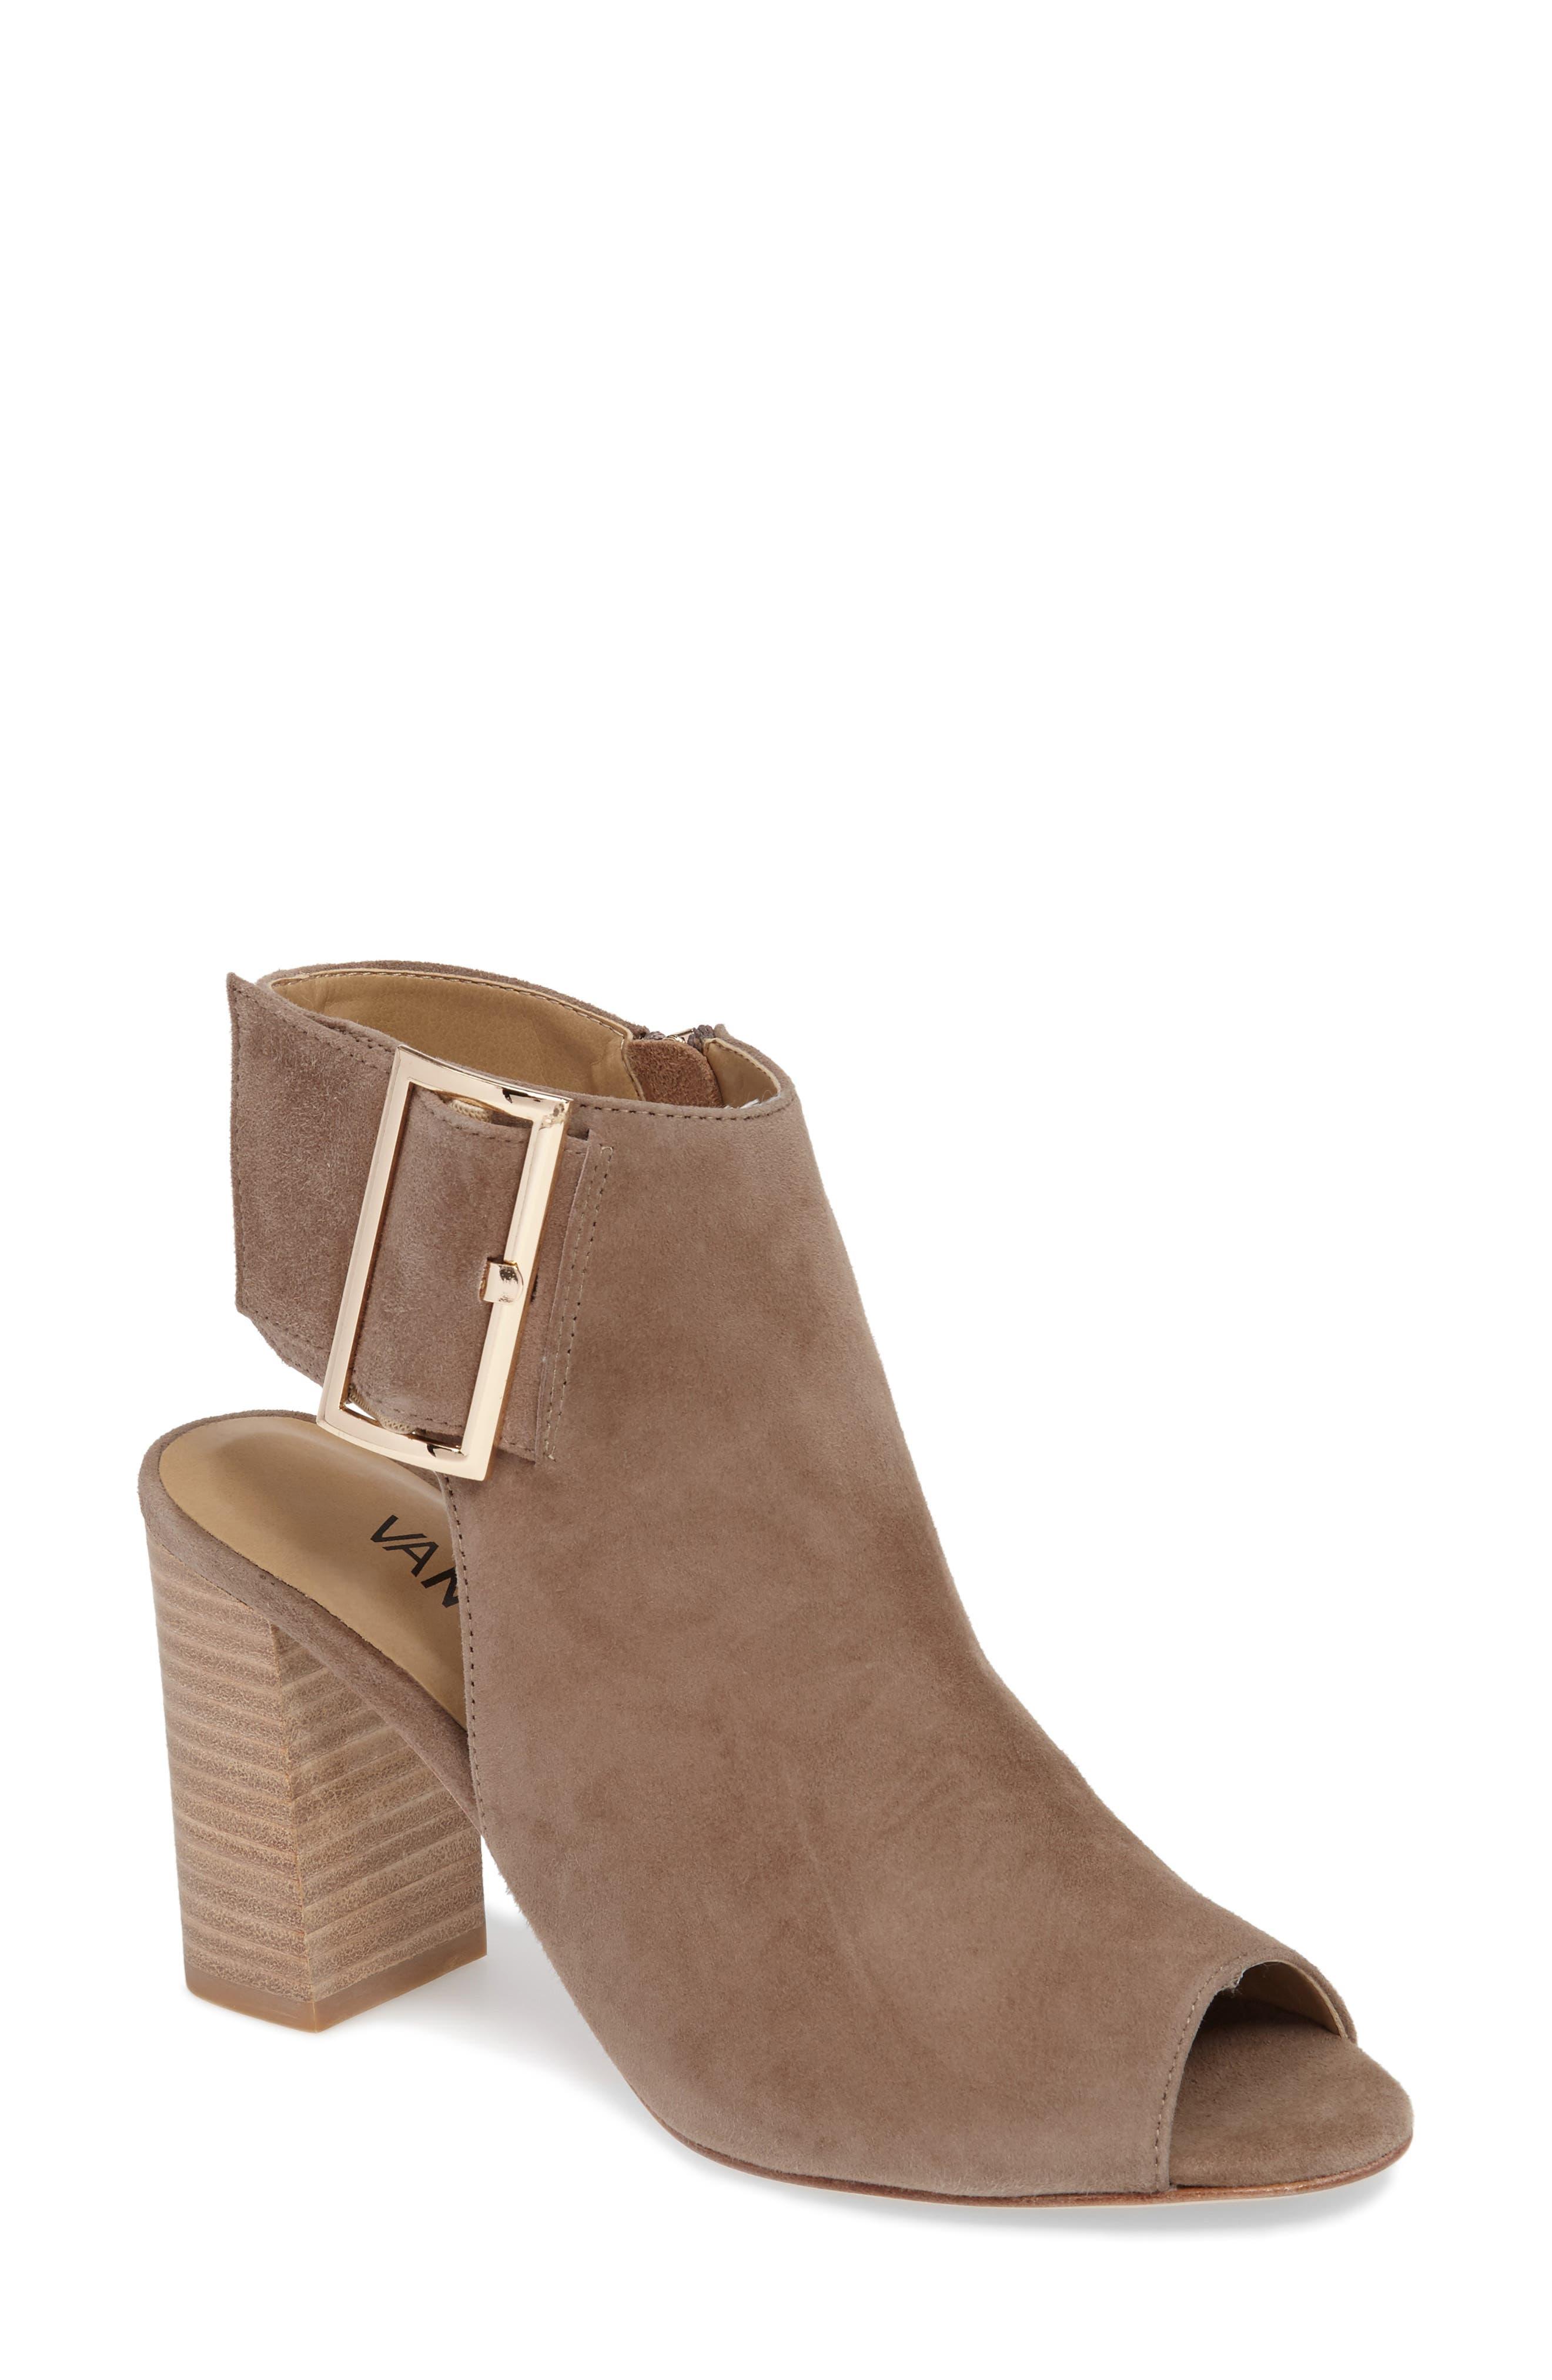 Alternate Image 1 Selected - VANELi 'Bisa' Peep Toe Slingback Sandal (Women)